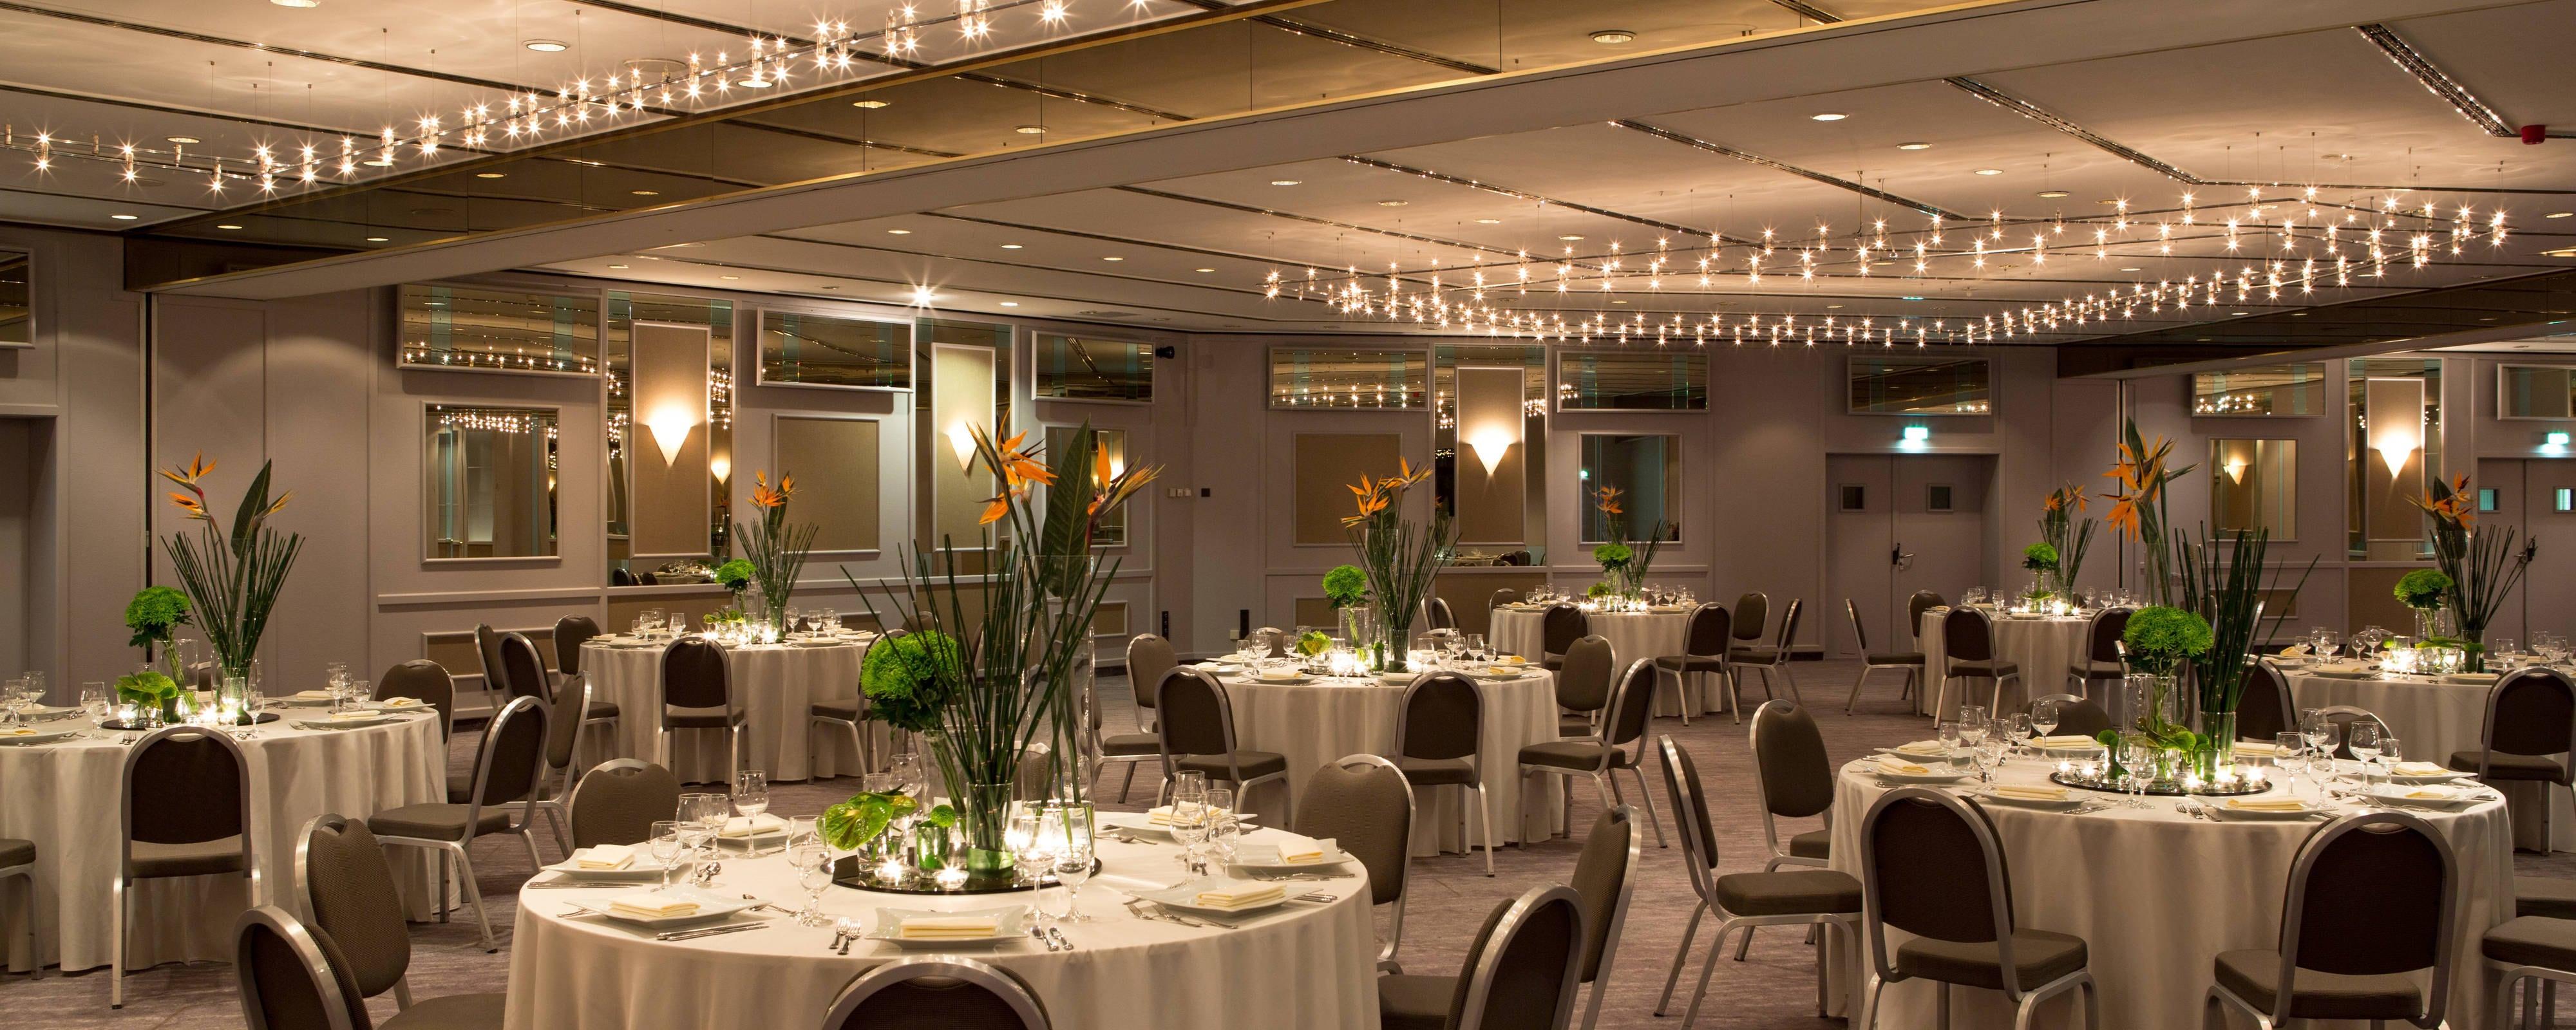 duesseldorf wedding reception venues renaissance duesseldorf hotel. Black Bedroom Furniture Sets. Home Design Ideas